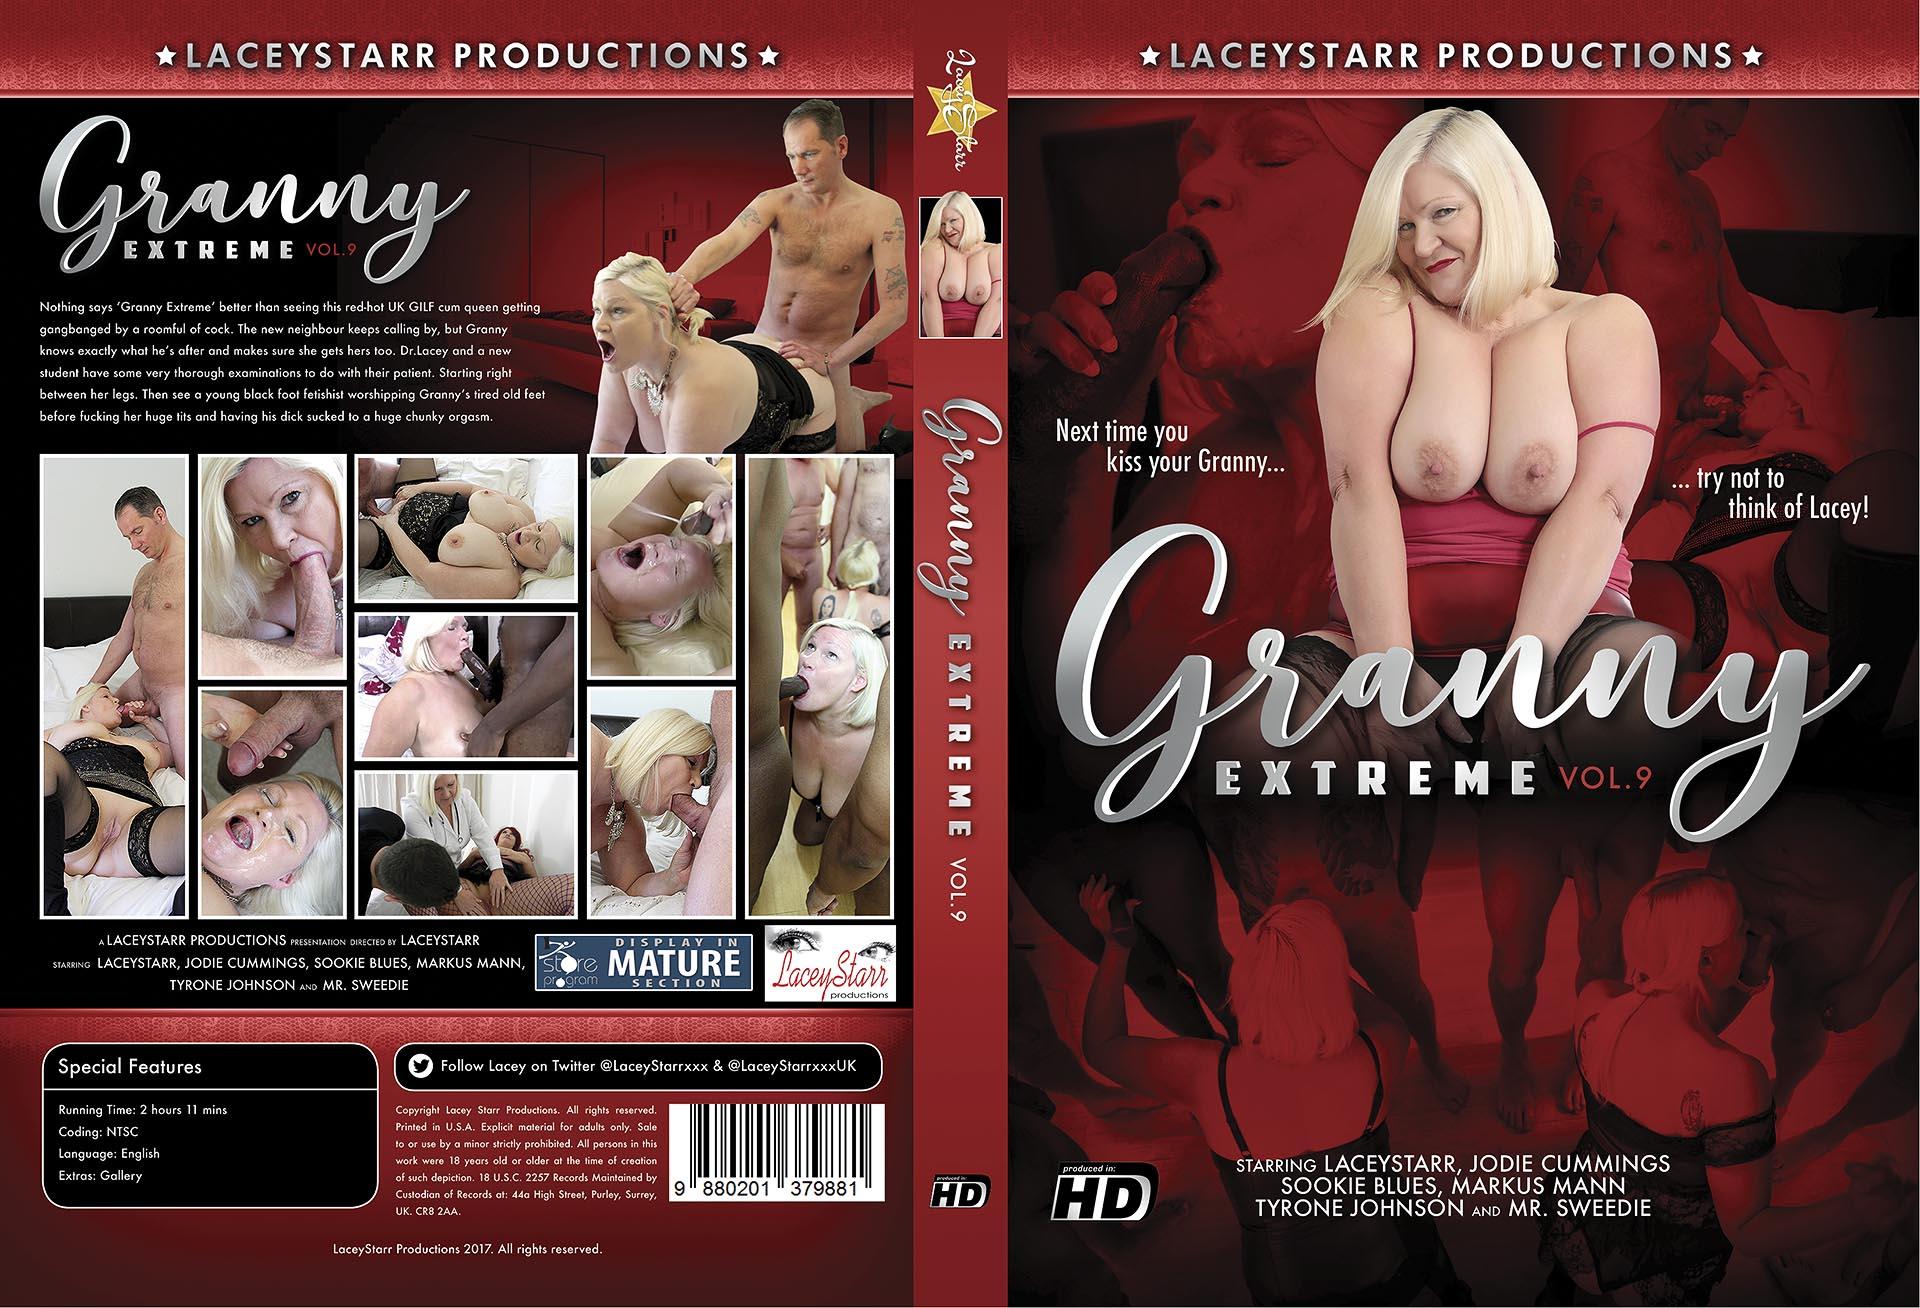 LS_GrannyExtreme_Volume9_UK_Sleeve_Large.jpg